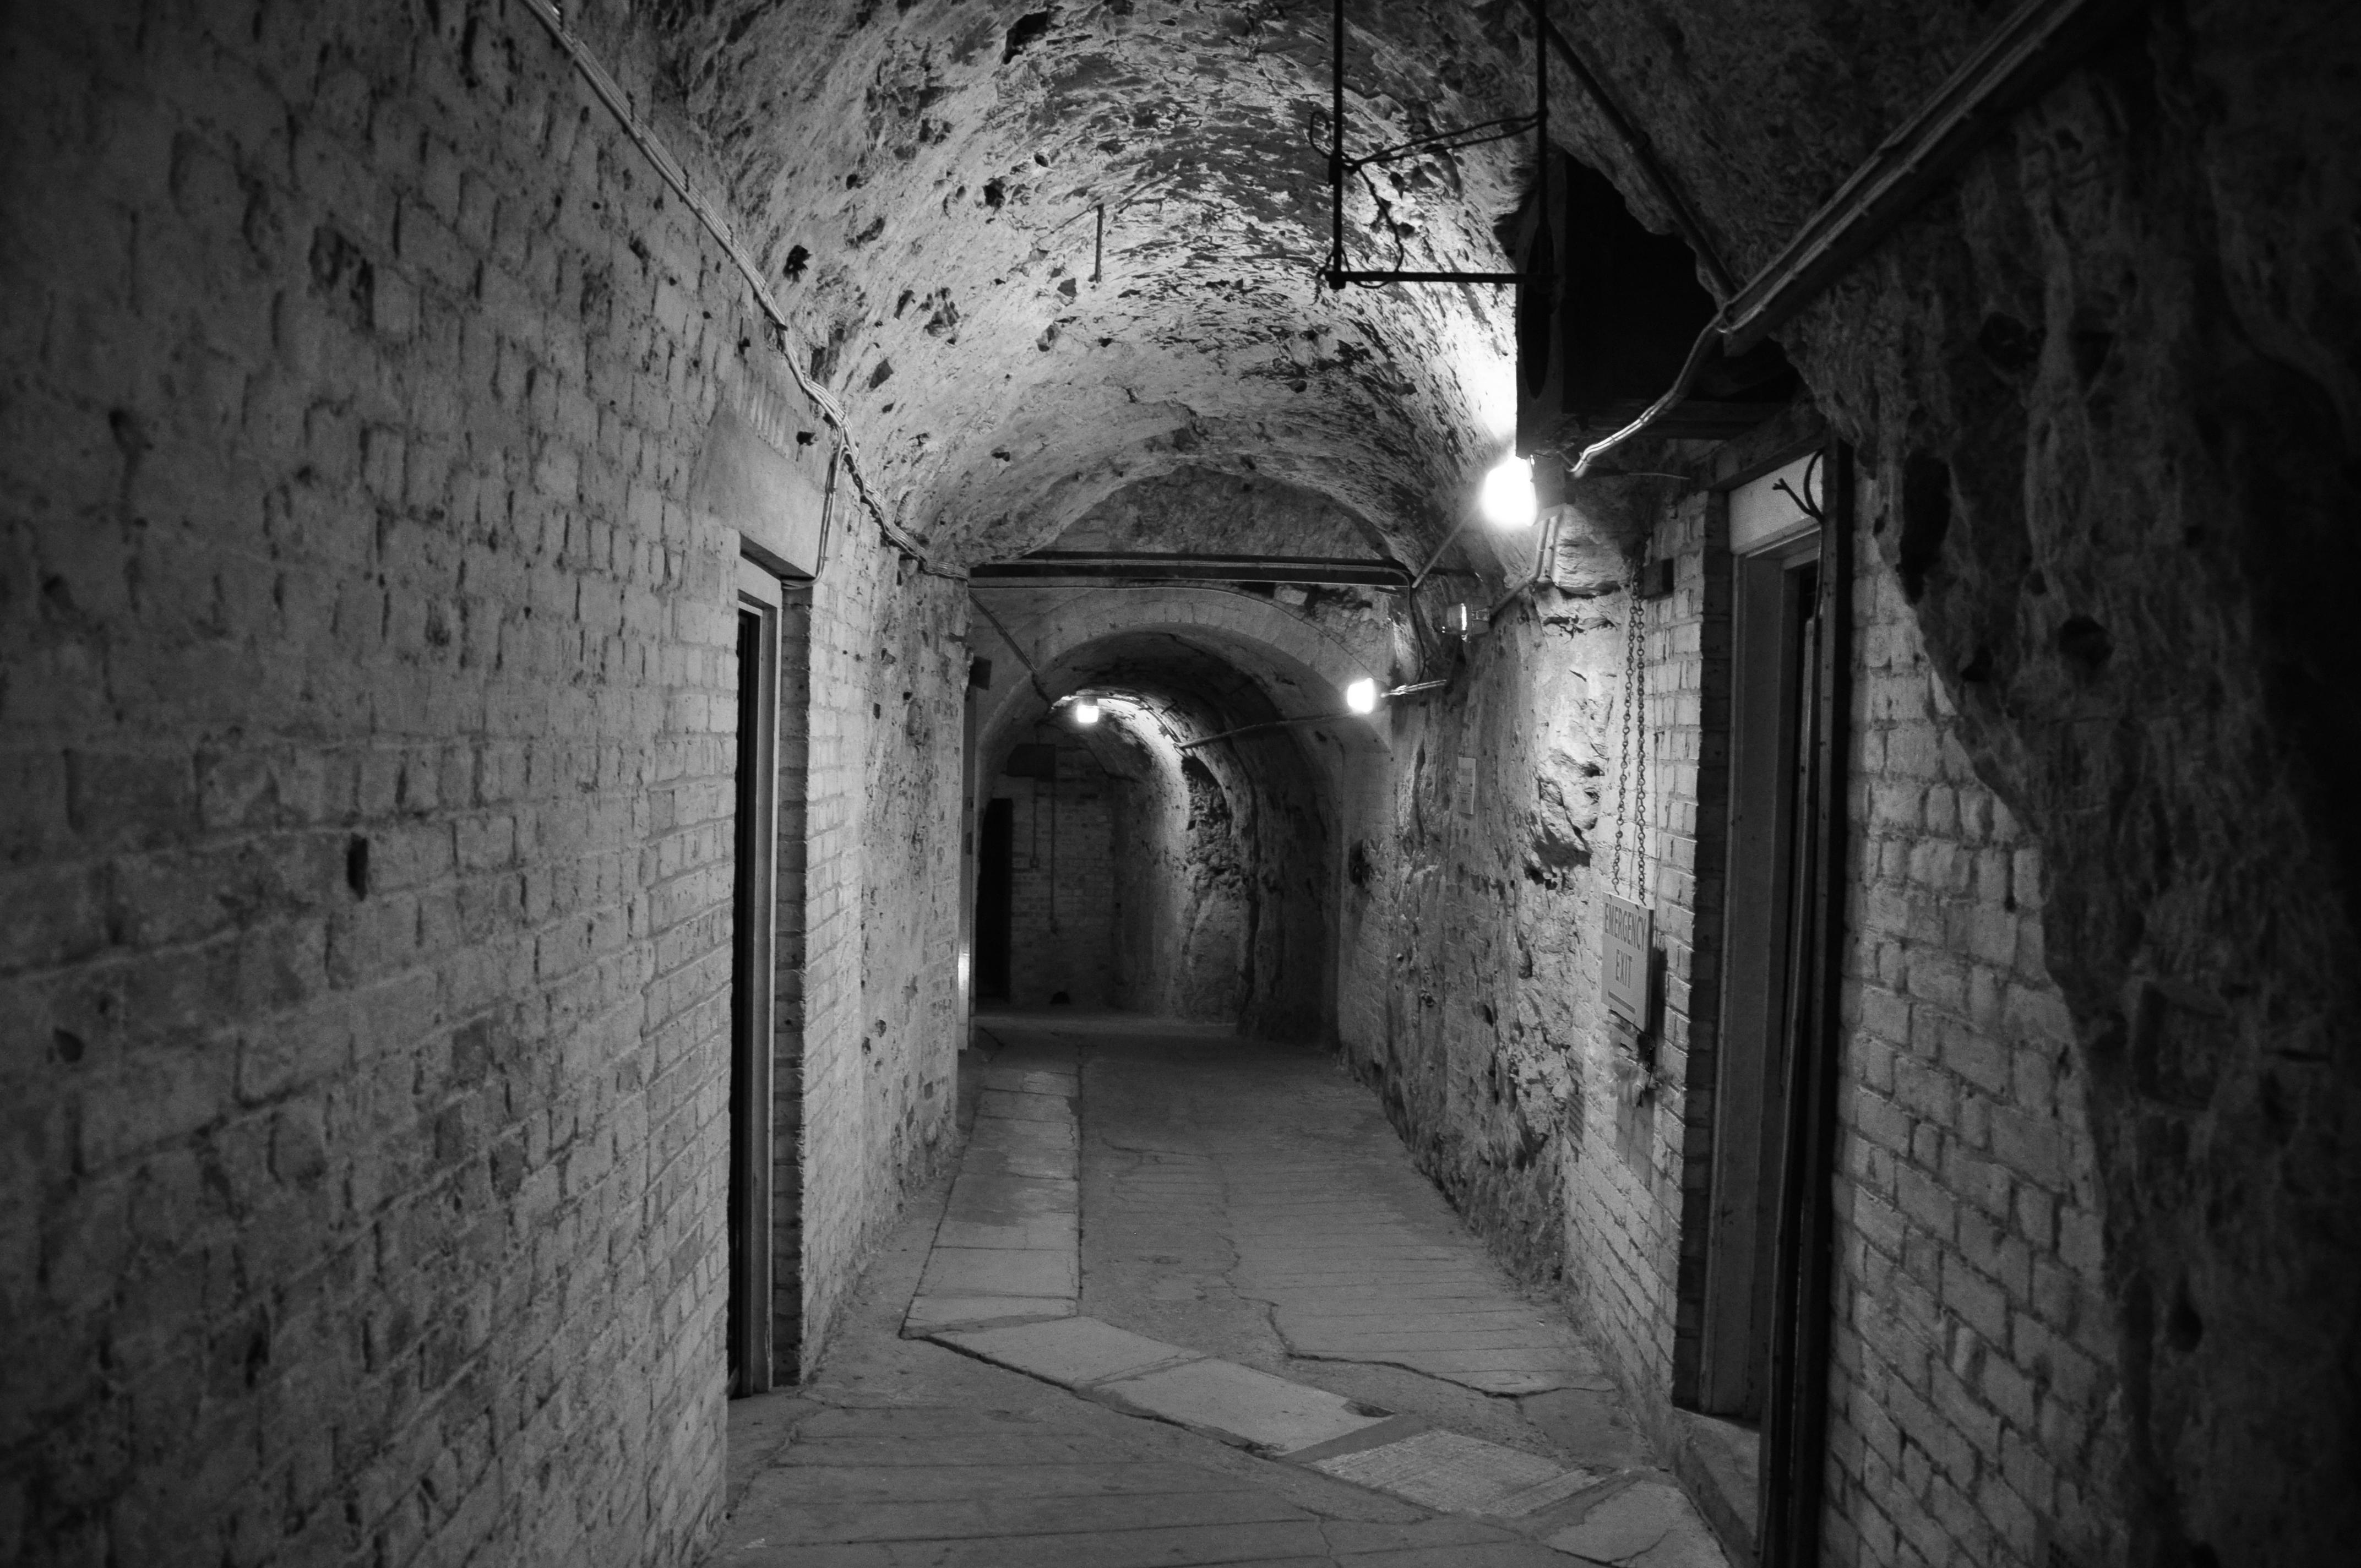 Dover Castle Secret War Tunnels | Sercret tunnels under ...